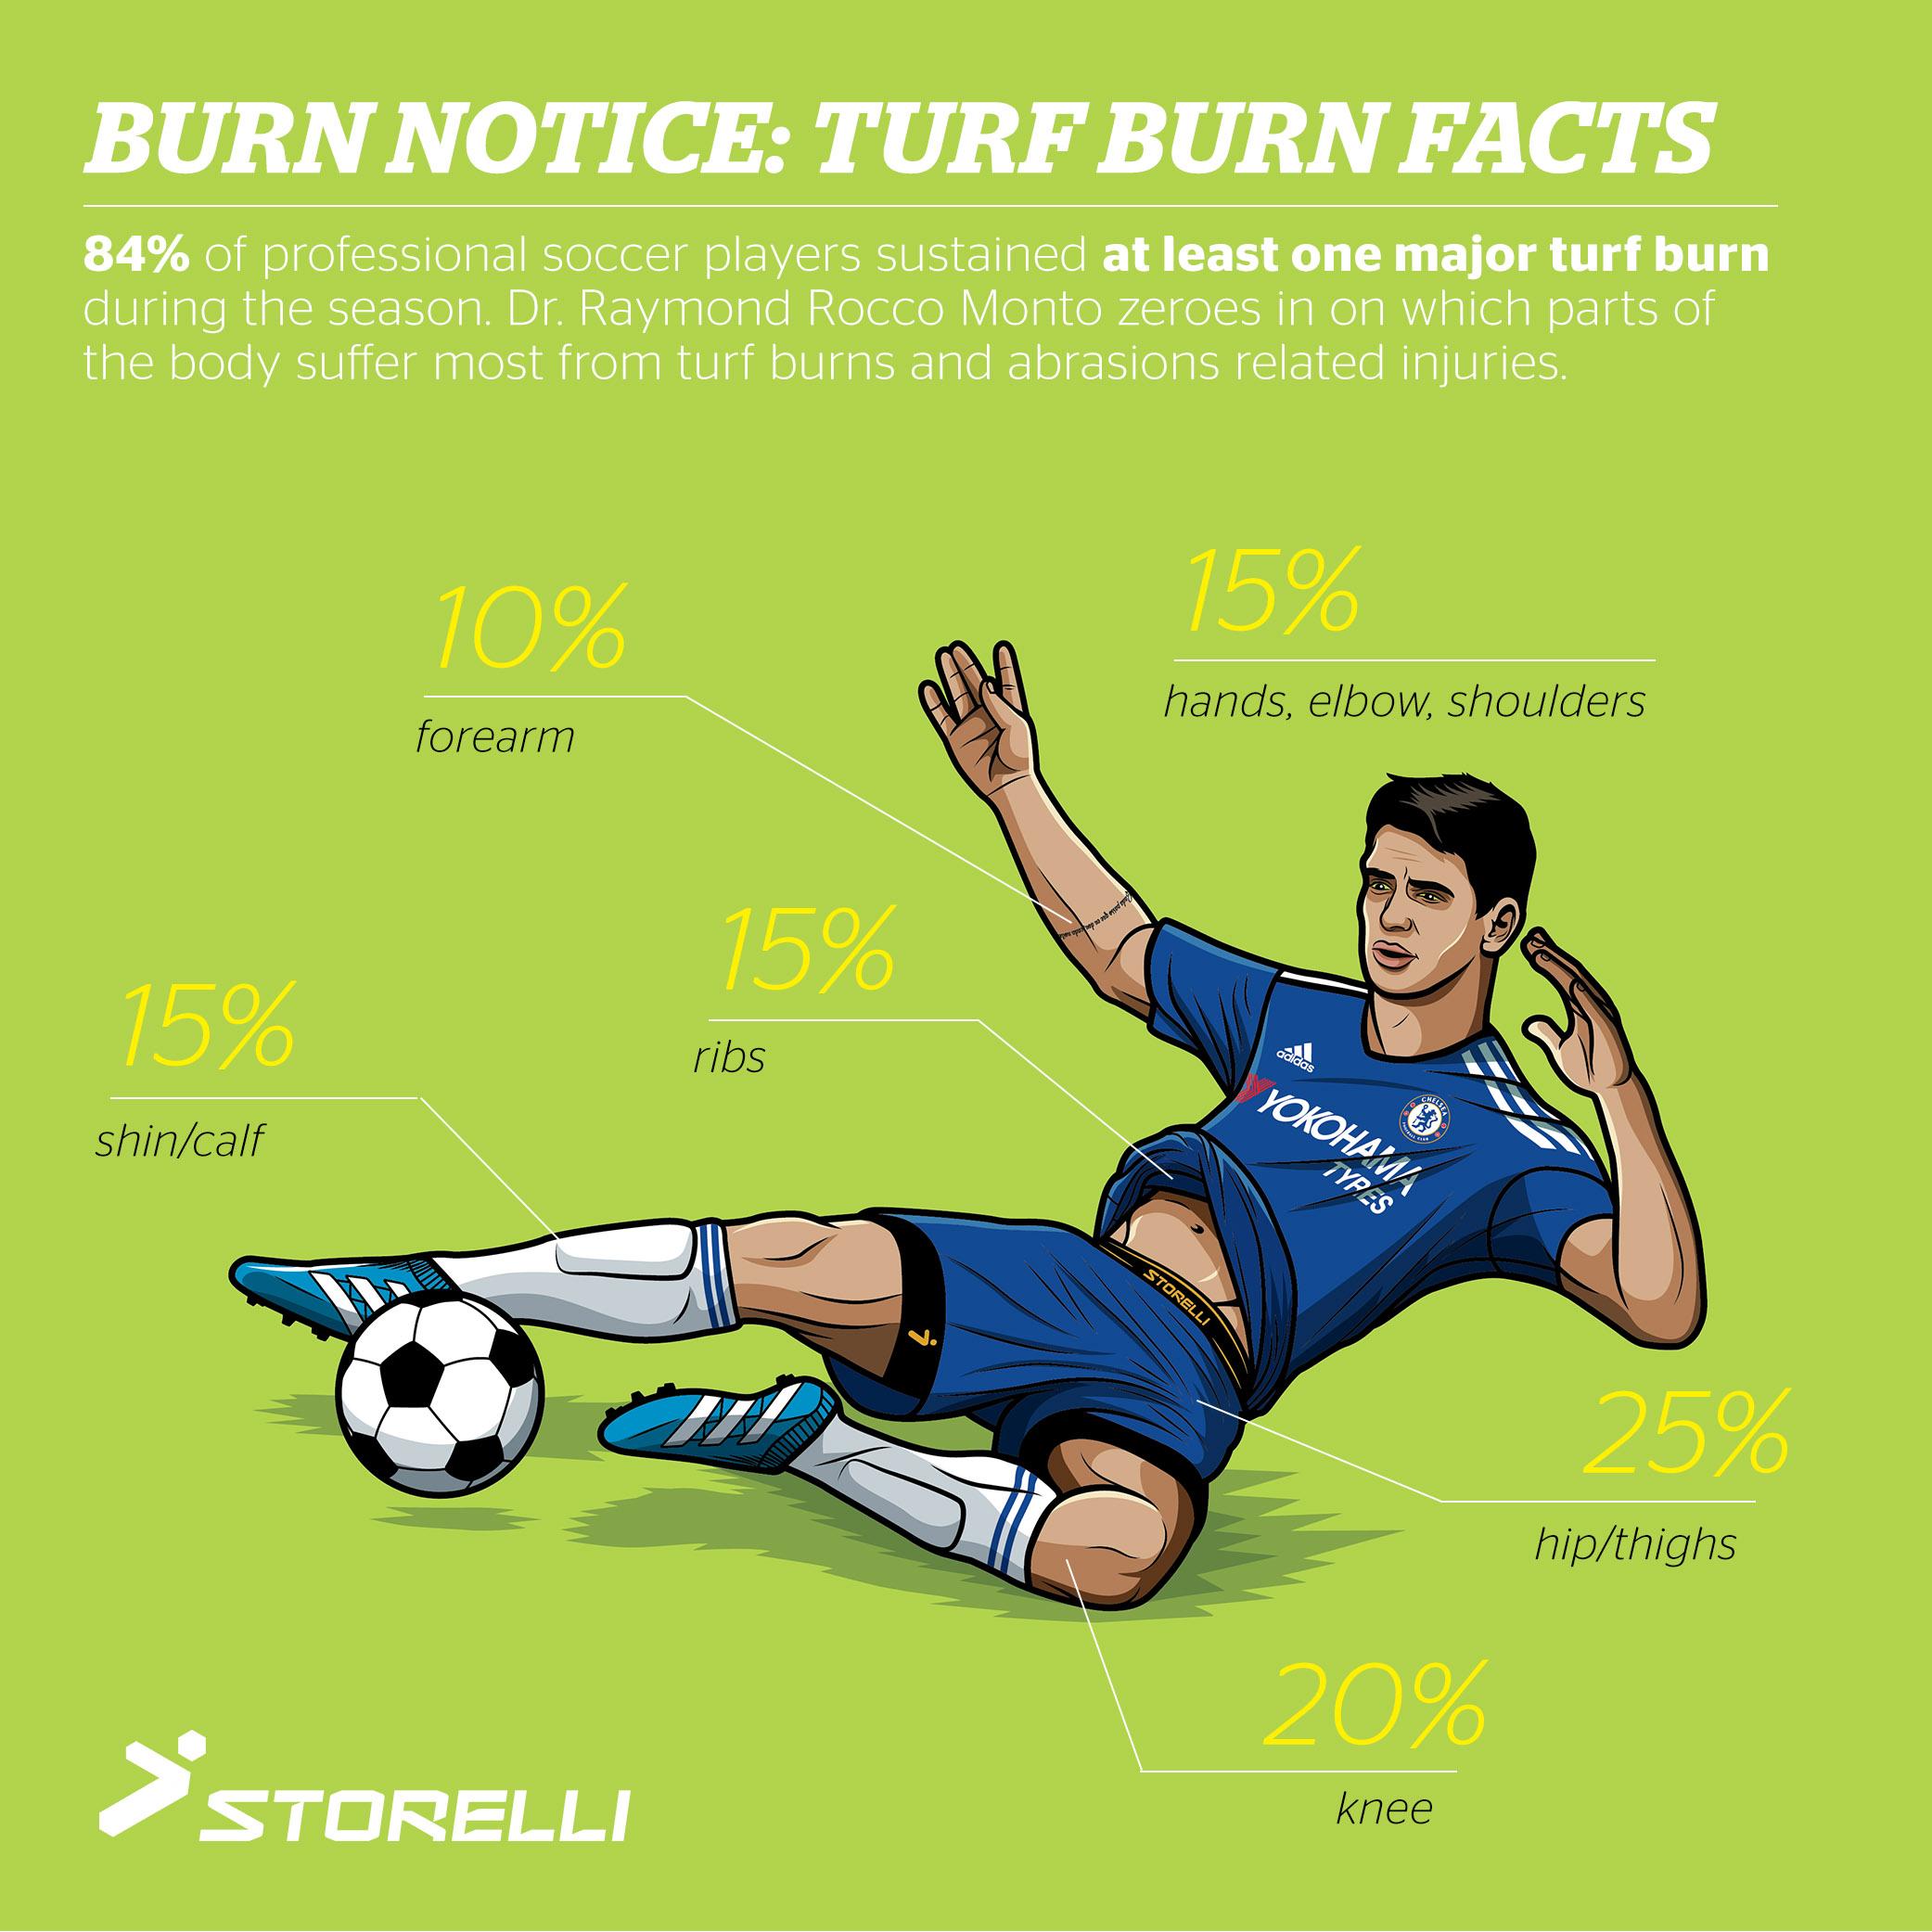 infographic image: Storelli.com